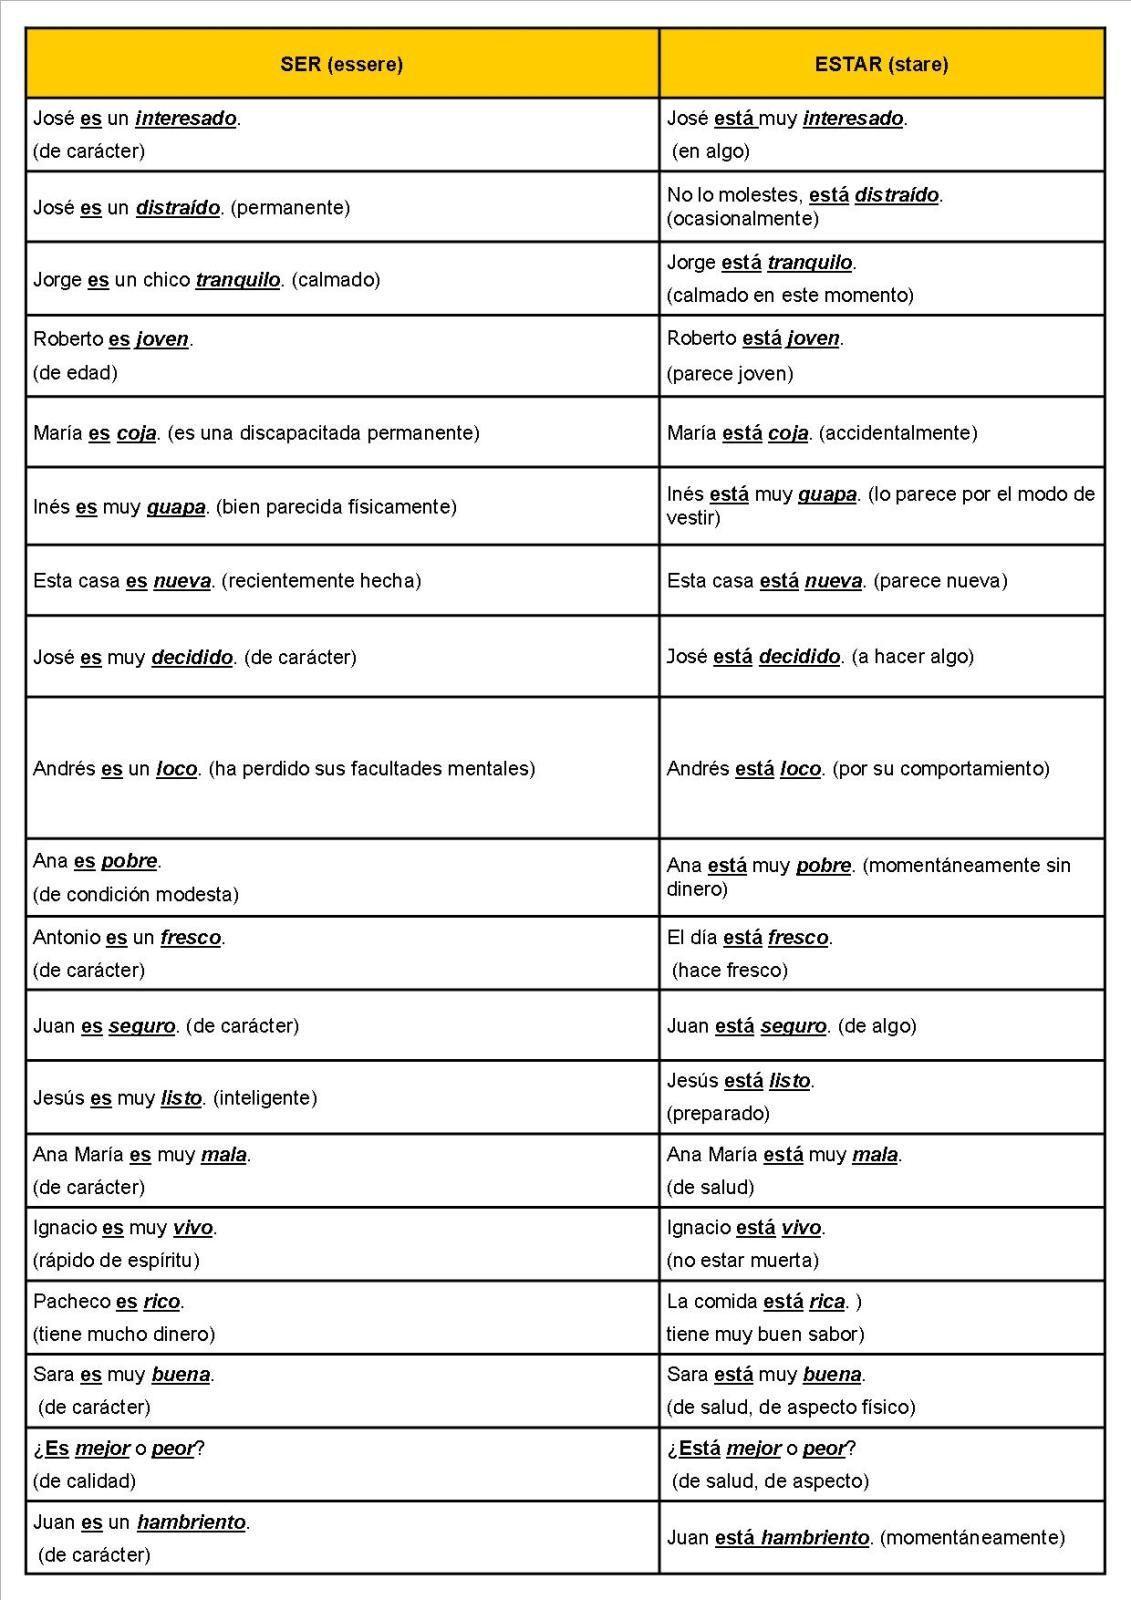 18 Diferencias Entre Ser Estar Y Hay Spanish Verbs Learning Spanish Spanish Lessons [ 1600 x 1131 Pixel ]